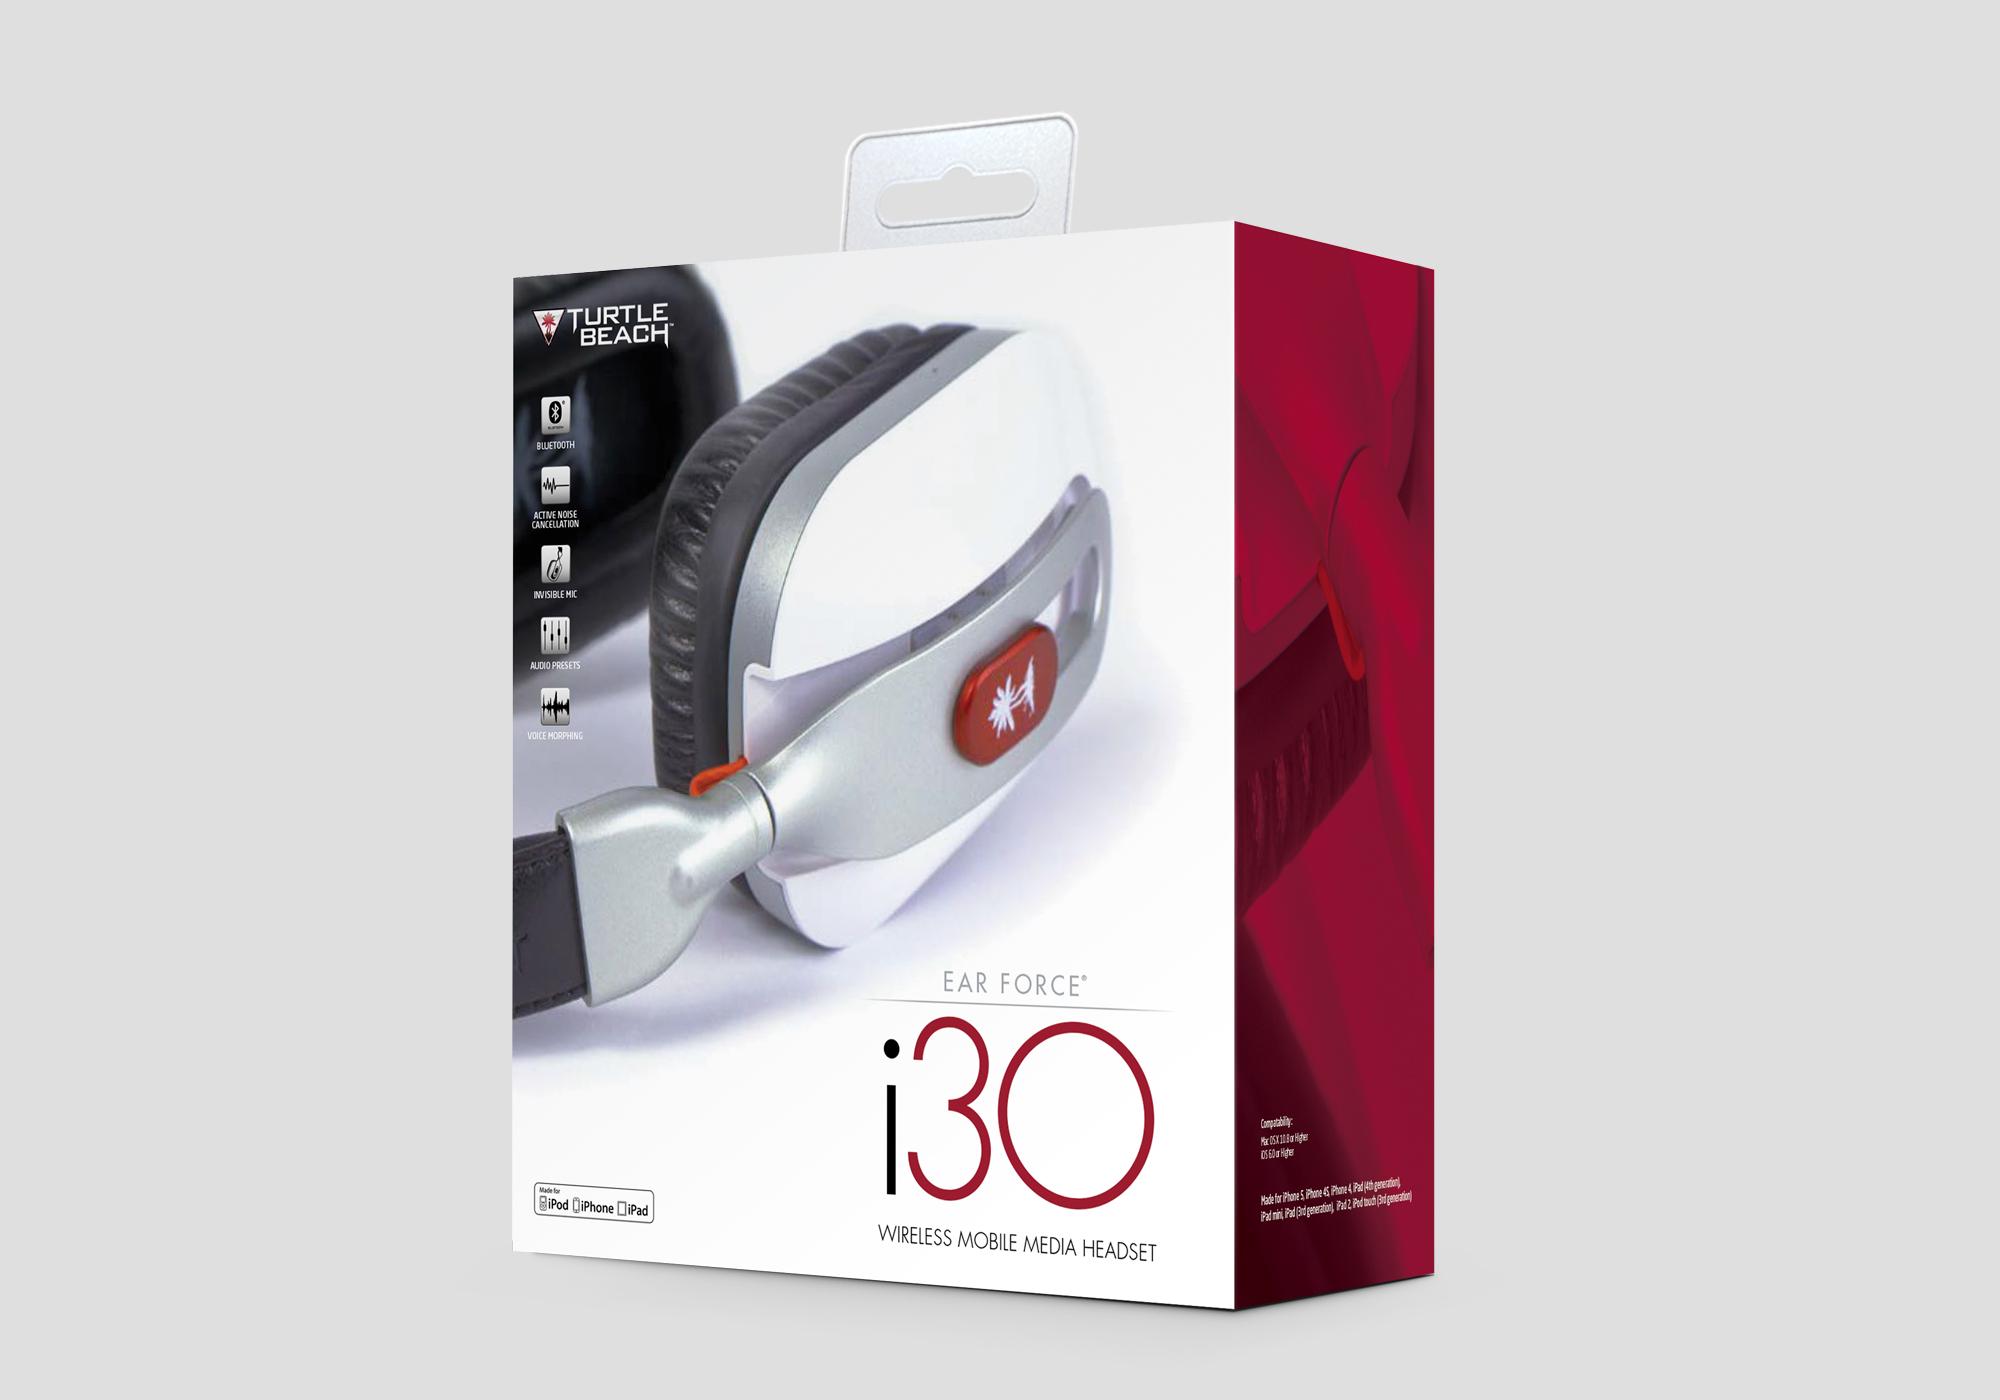 test du turtle beach ear force i30 iphone ipad ipod page 1 gamalive. Black Bedroom Furniture Sets. Home Design Ideas